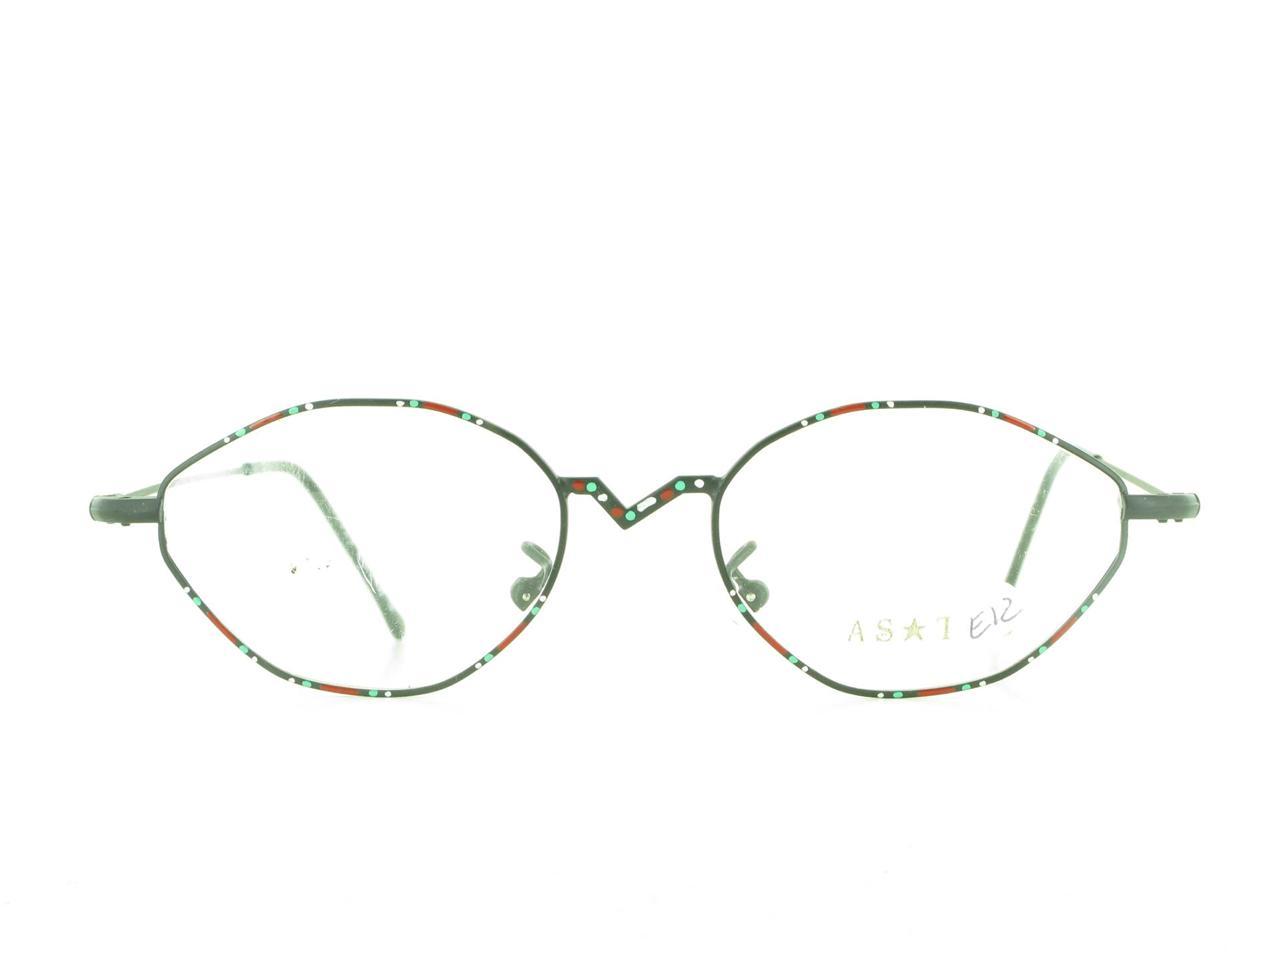 Unique Metal Eyeglass Frames : Unique Hand Painted ASTRO EYEGLASS FRAMES Italy Womens ...